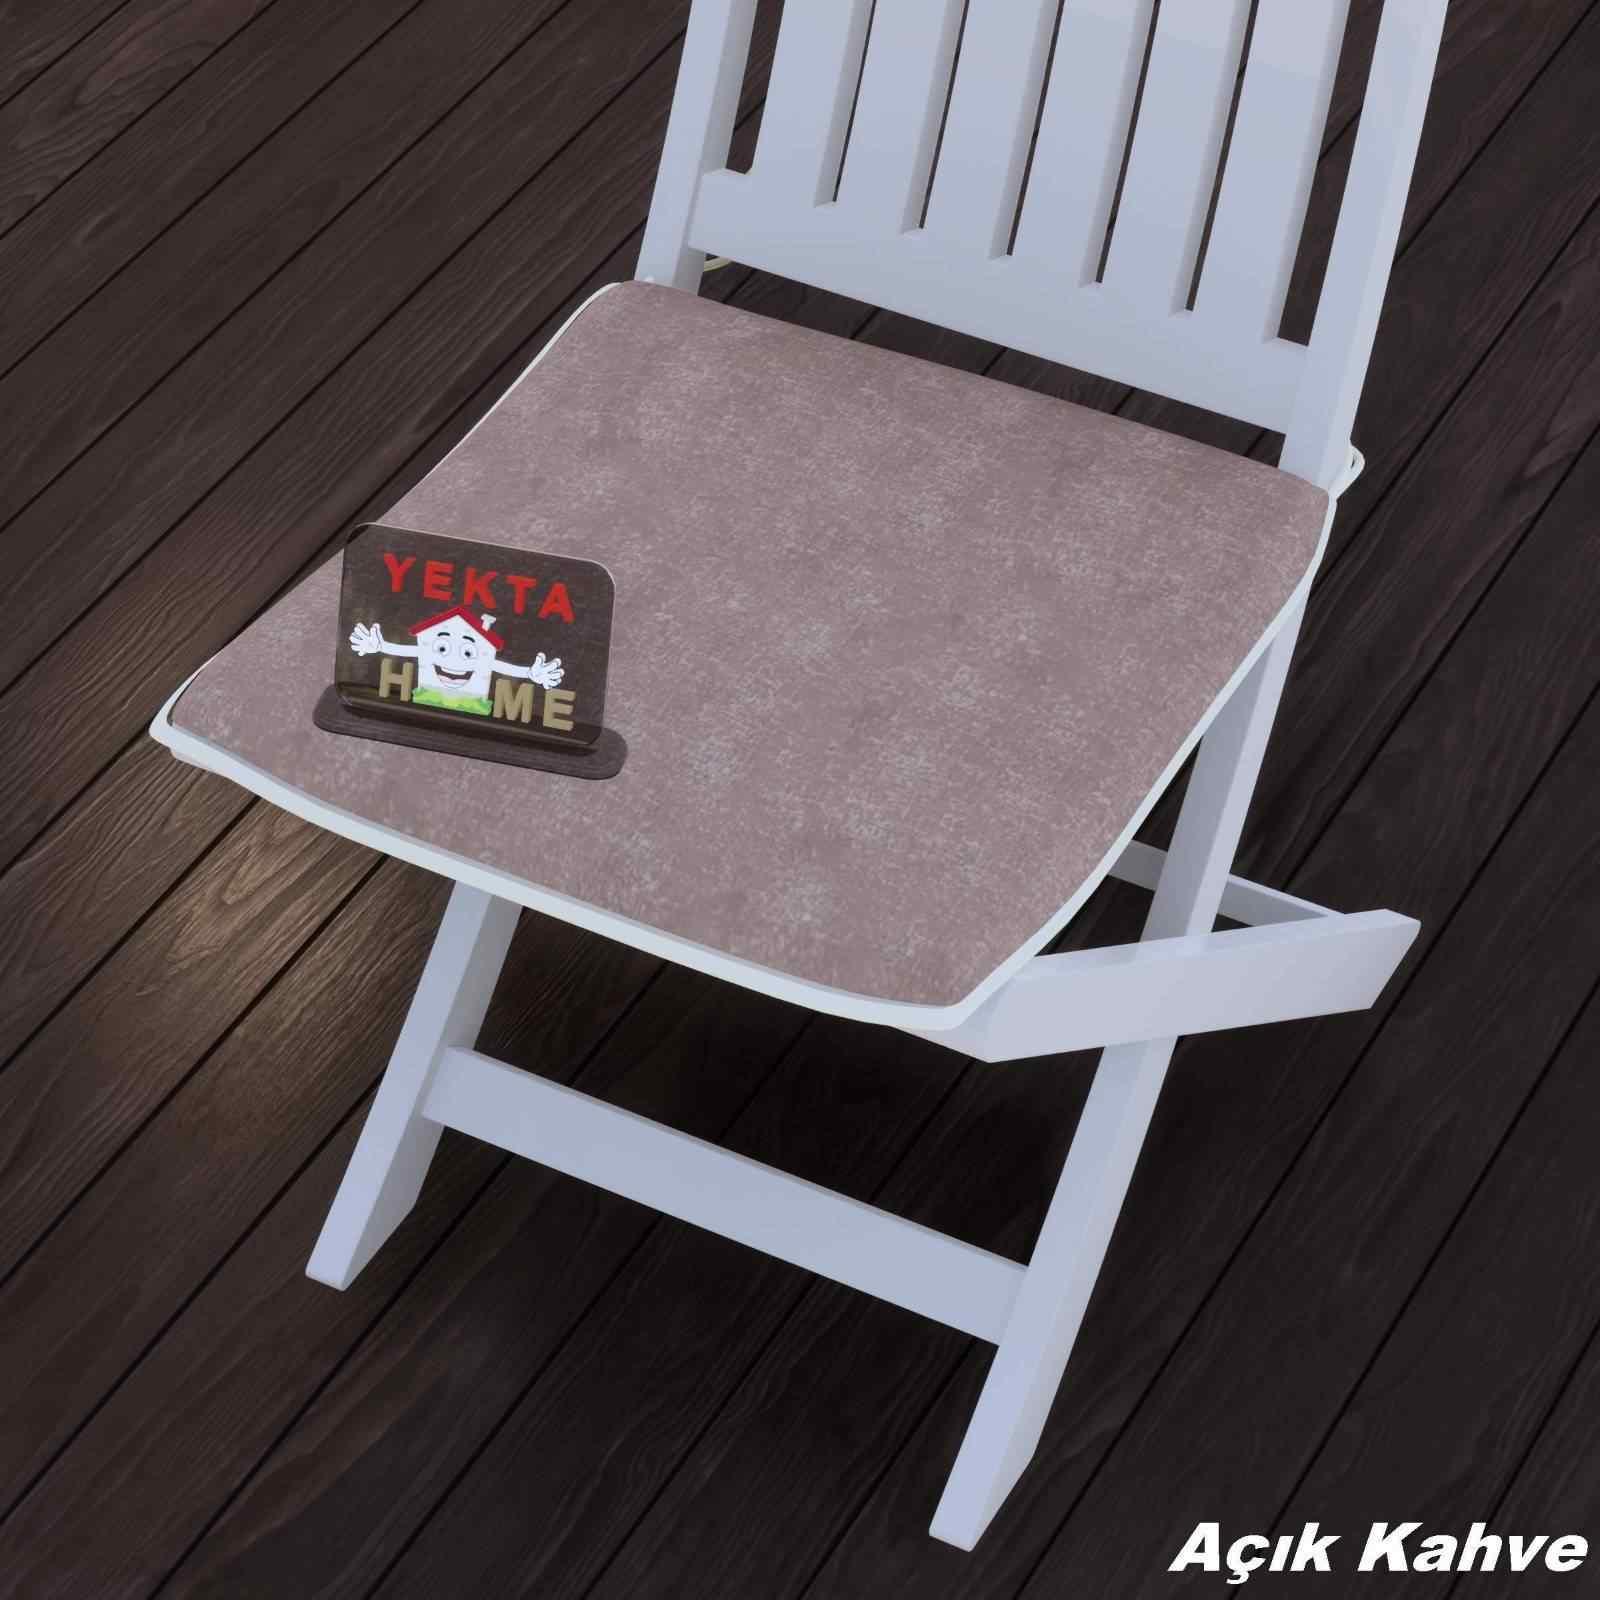 Sandalye Minderi - Rattan Koltuk Minderi 6 Adet Açık Kahve